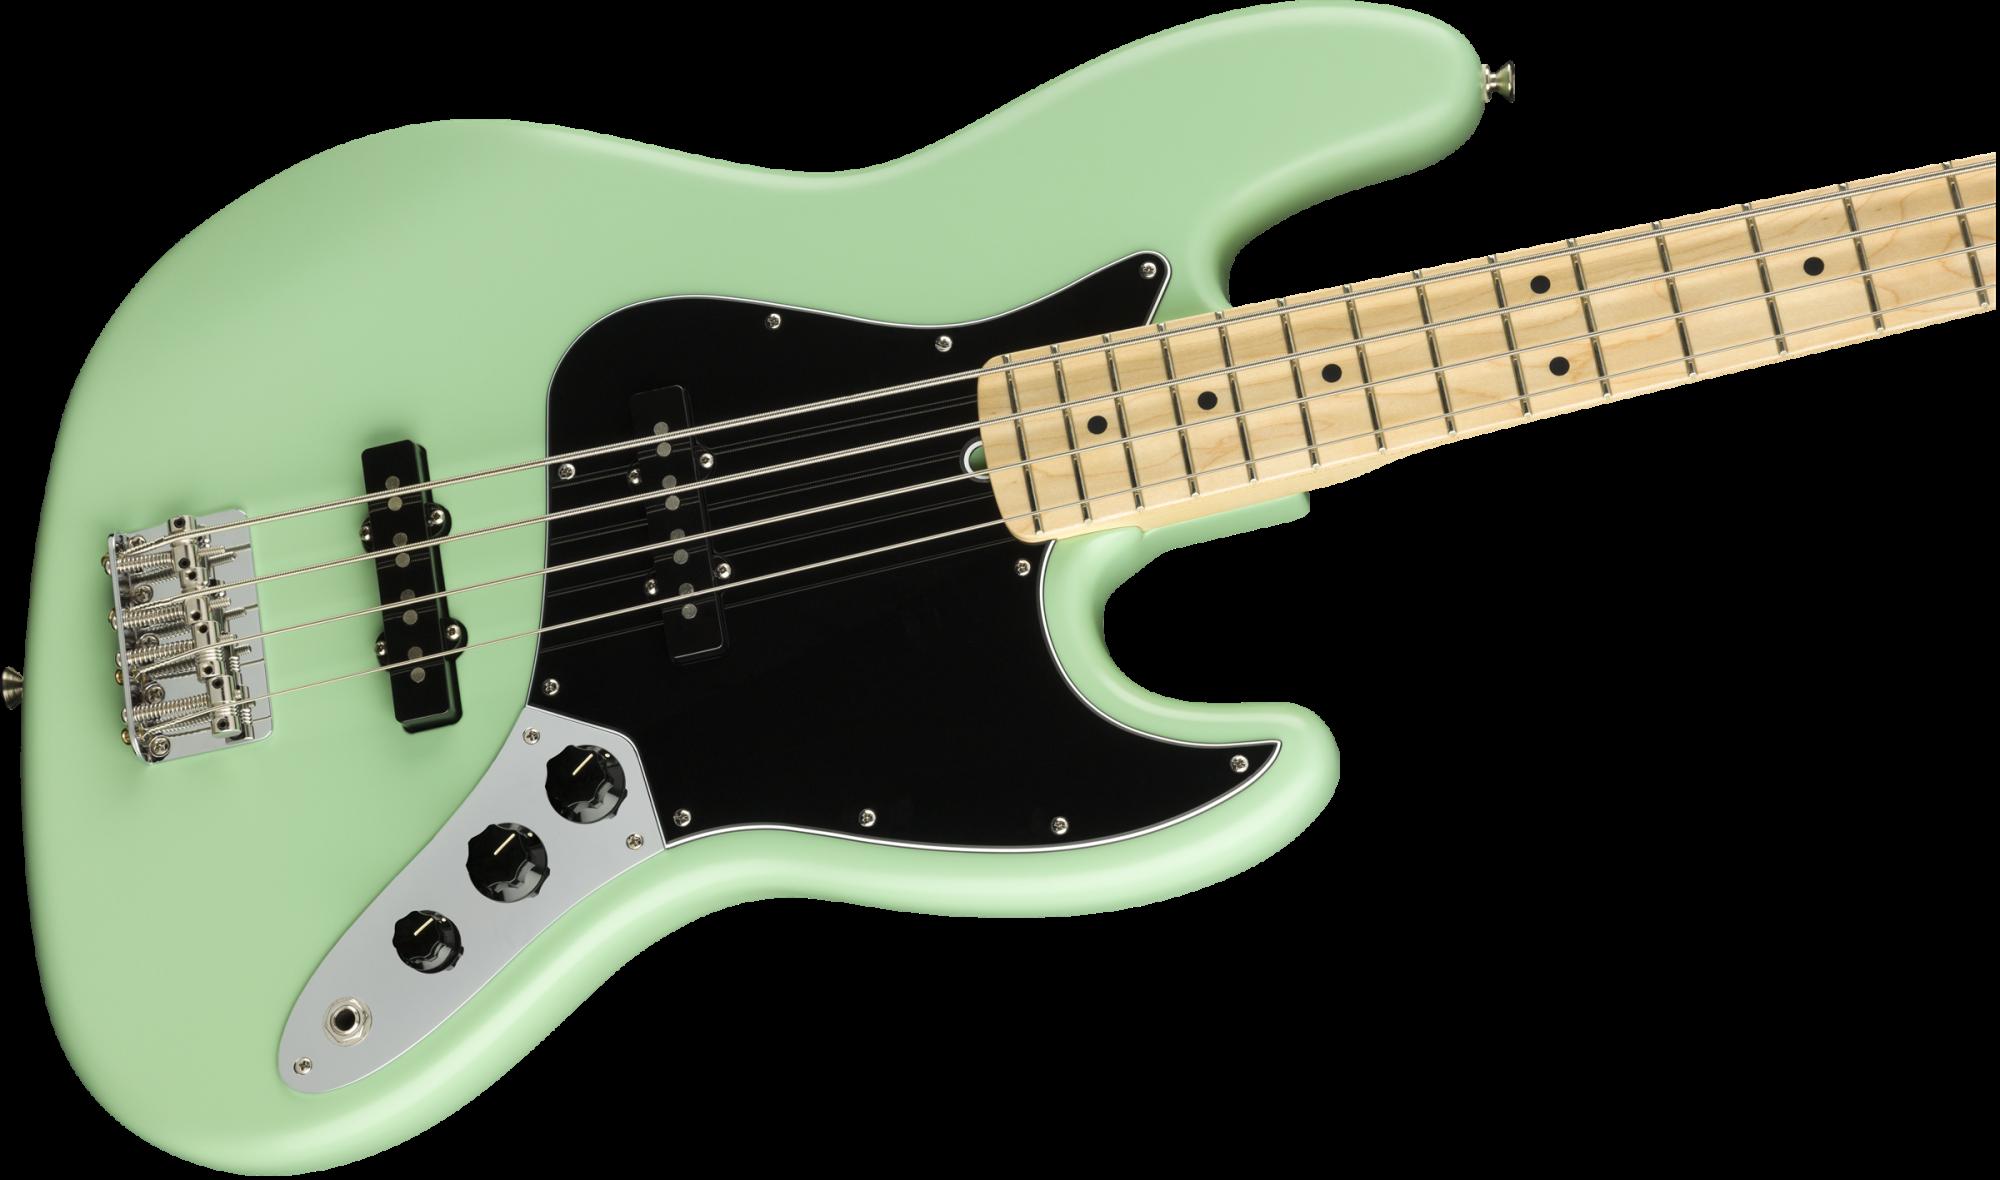 Fender American Performer Jazz Bass, Maple Fingerboard, Satin Surf Green